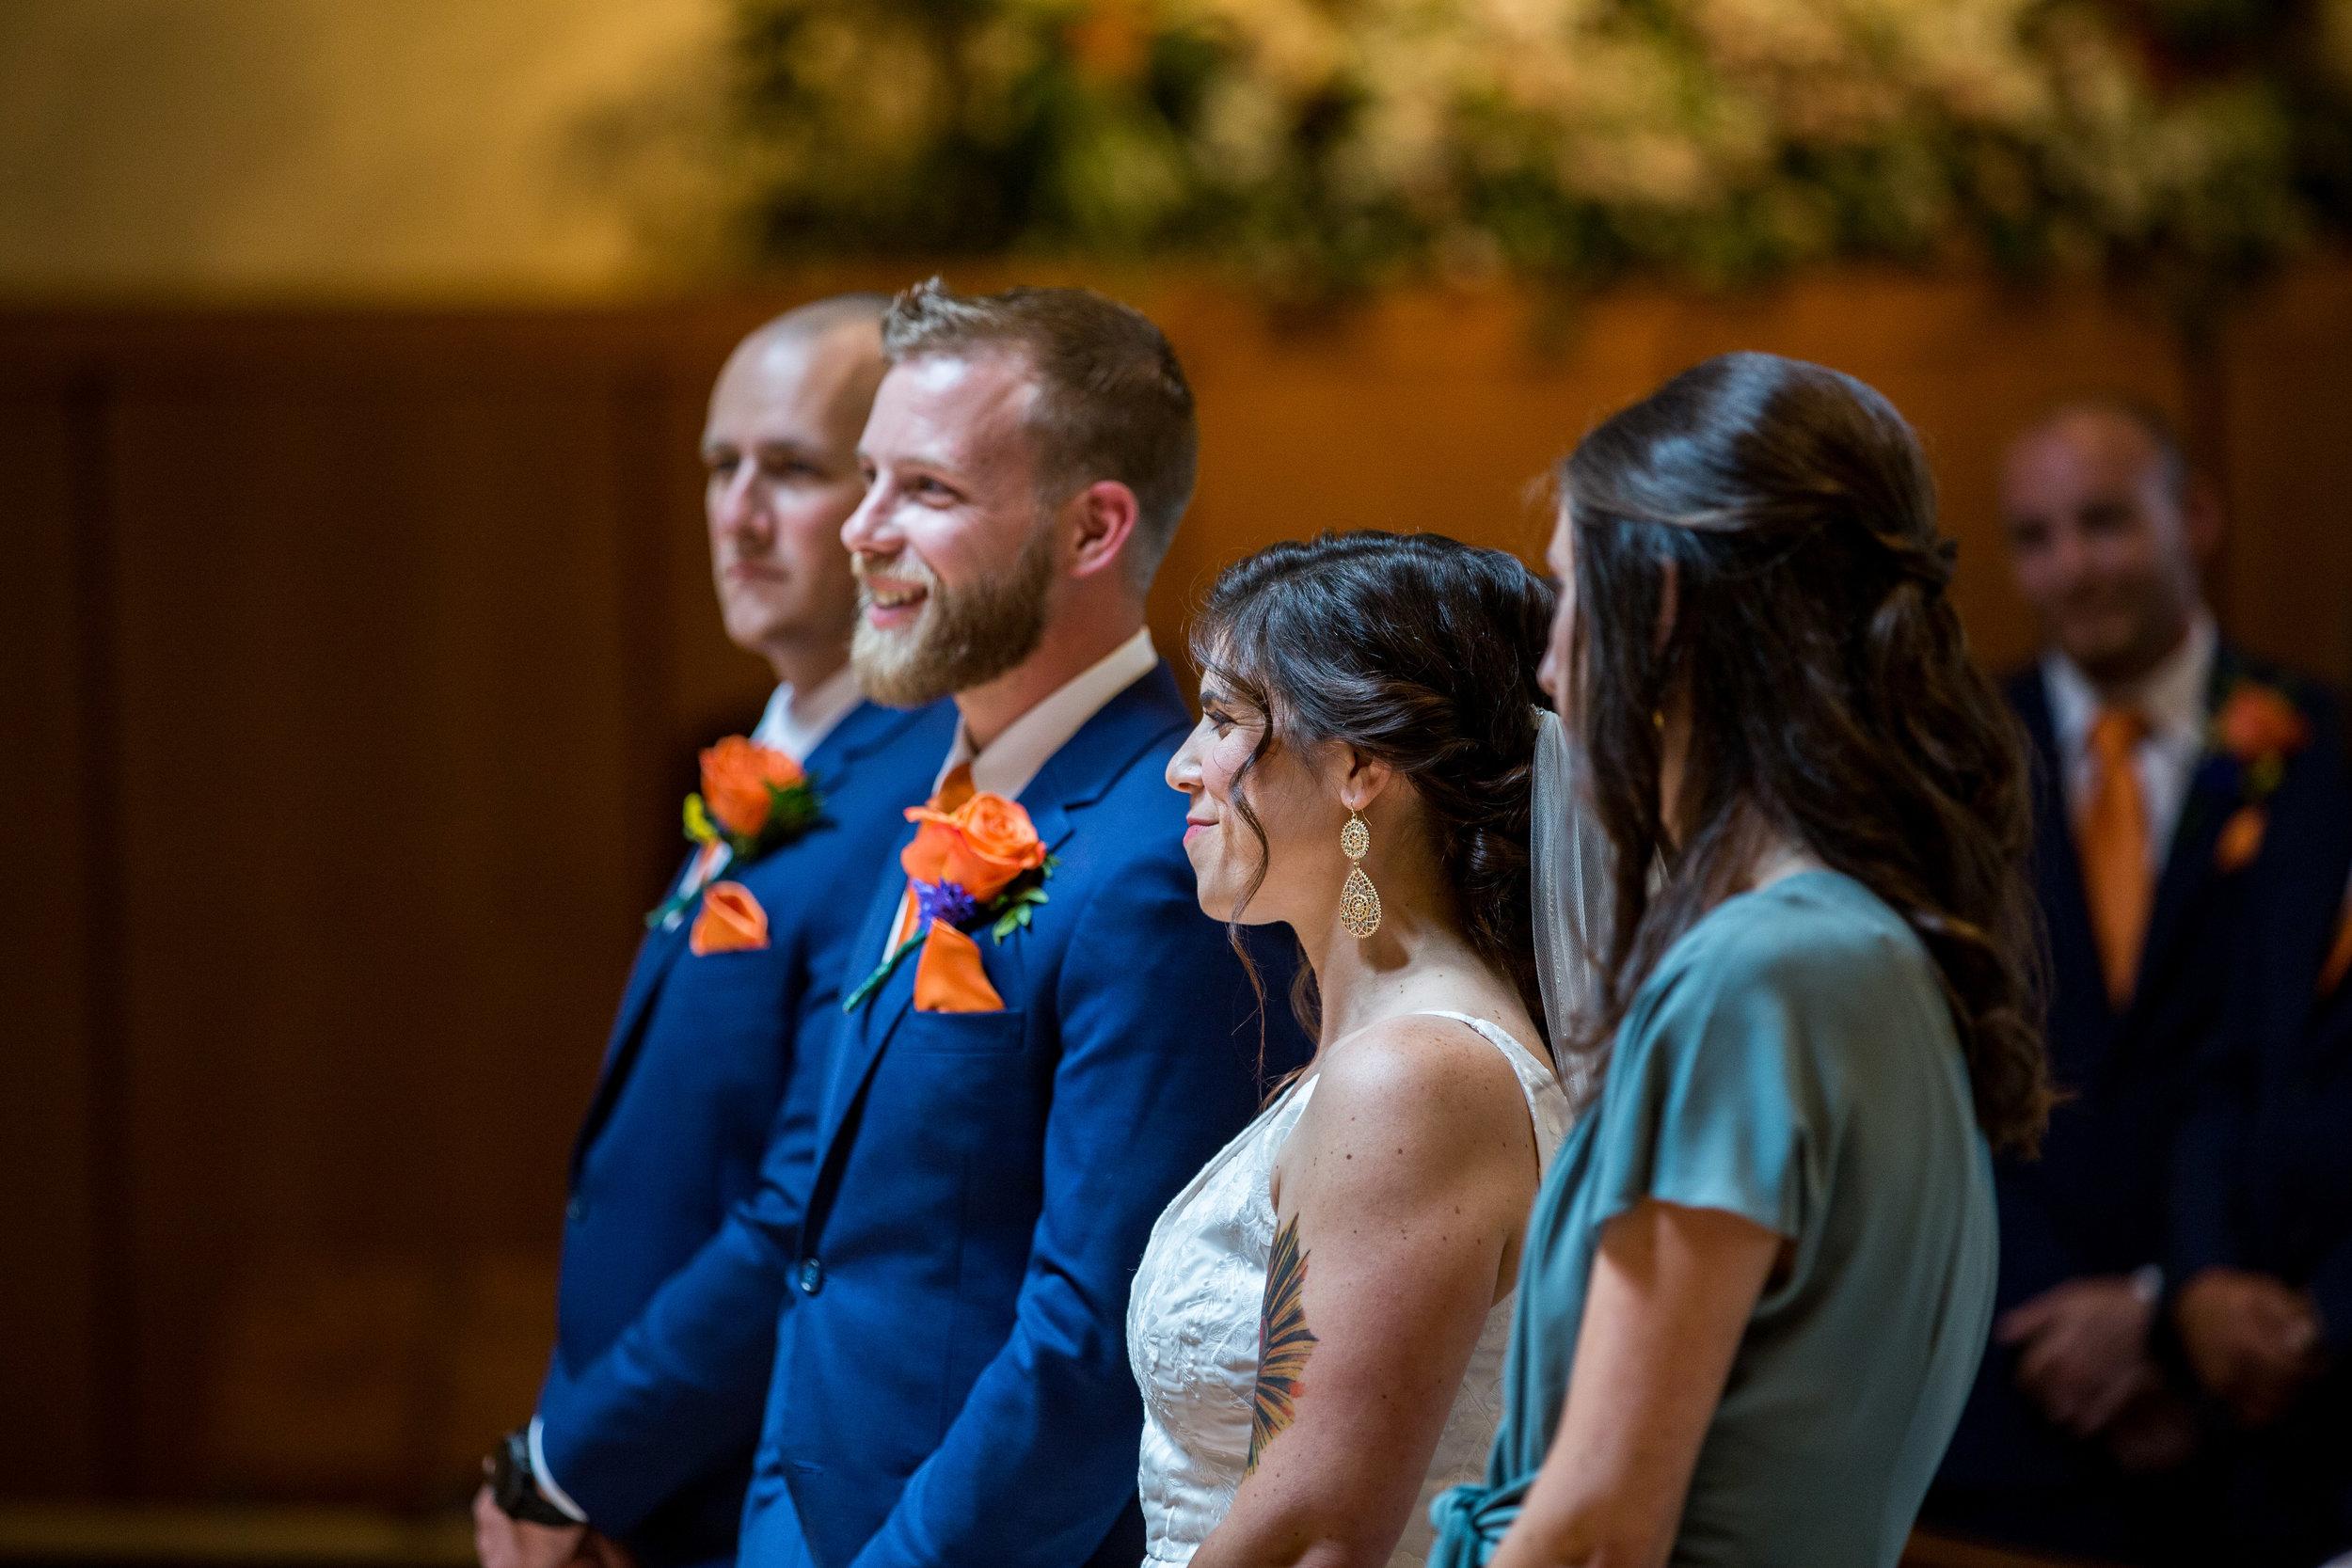 Natalie and Dallas Mooney Wedding 6-8-19_Tania Watt Photography-110.jpg